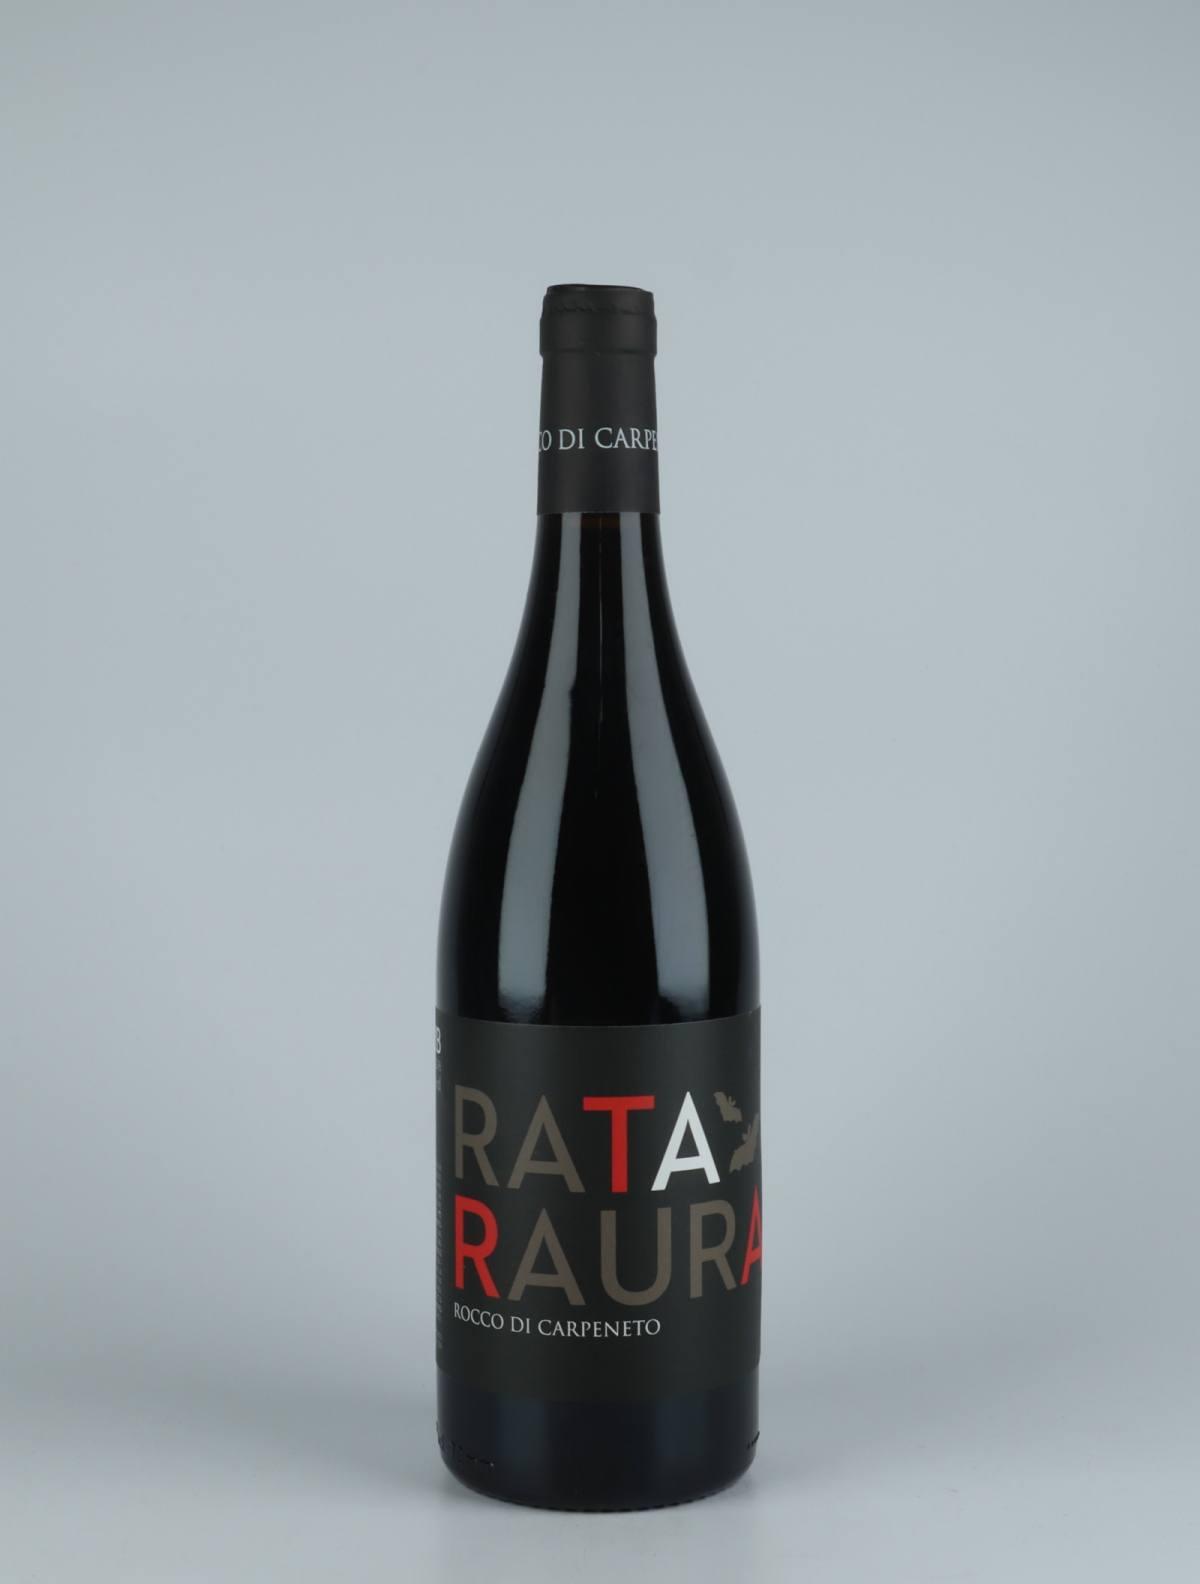 Rataraura